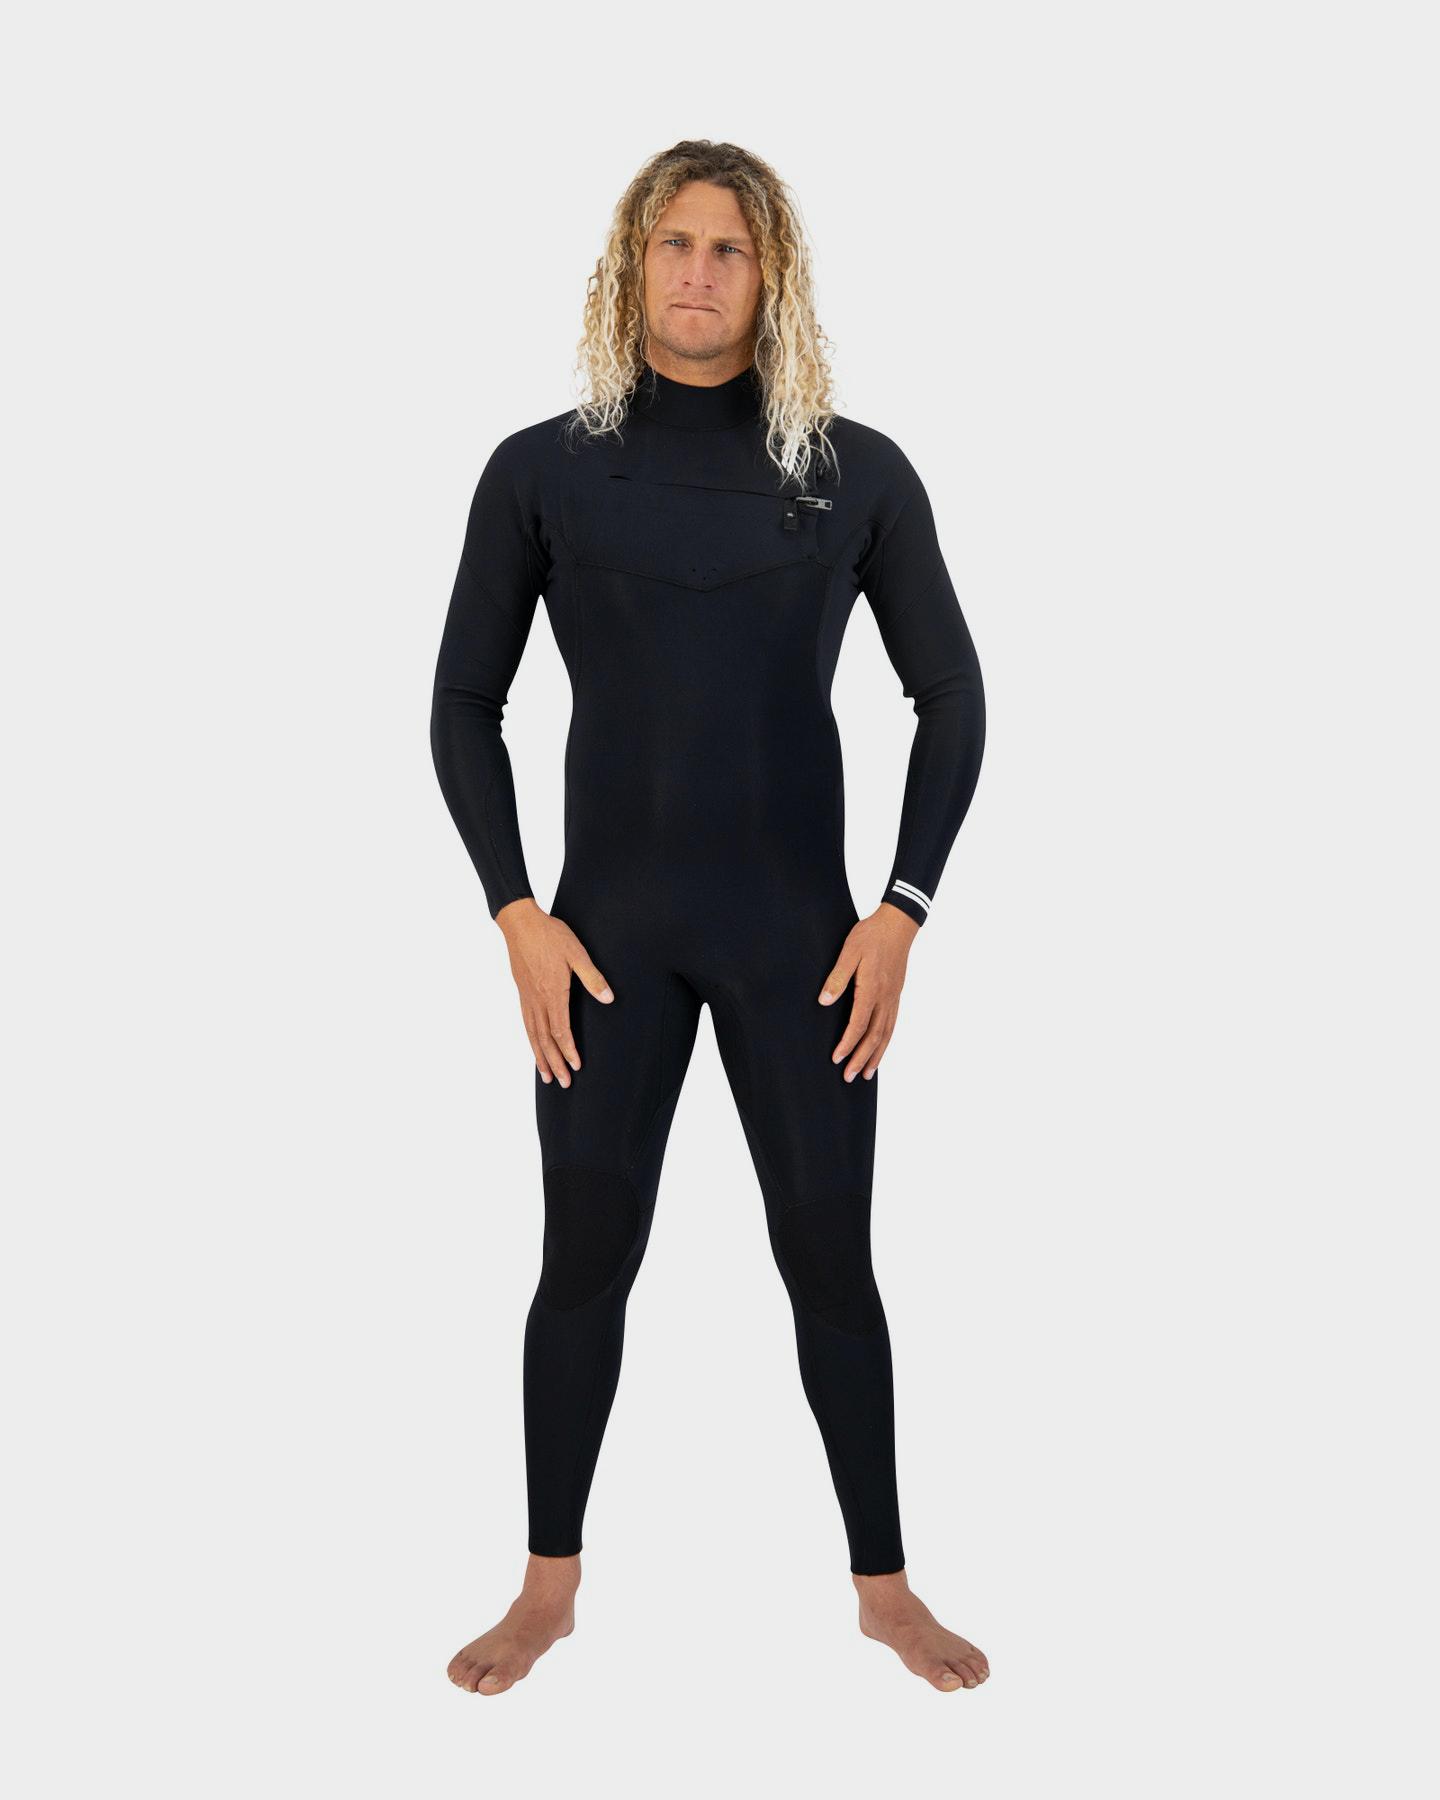 Coastlines Premium Mens 3/2 Chest Zip Steamer Black